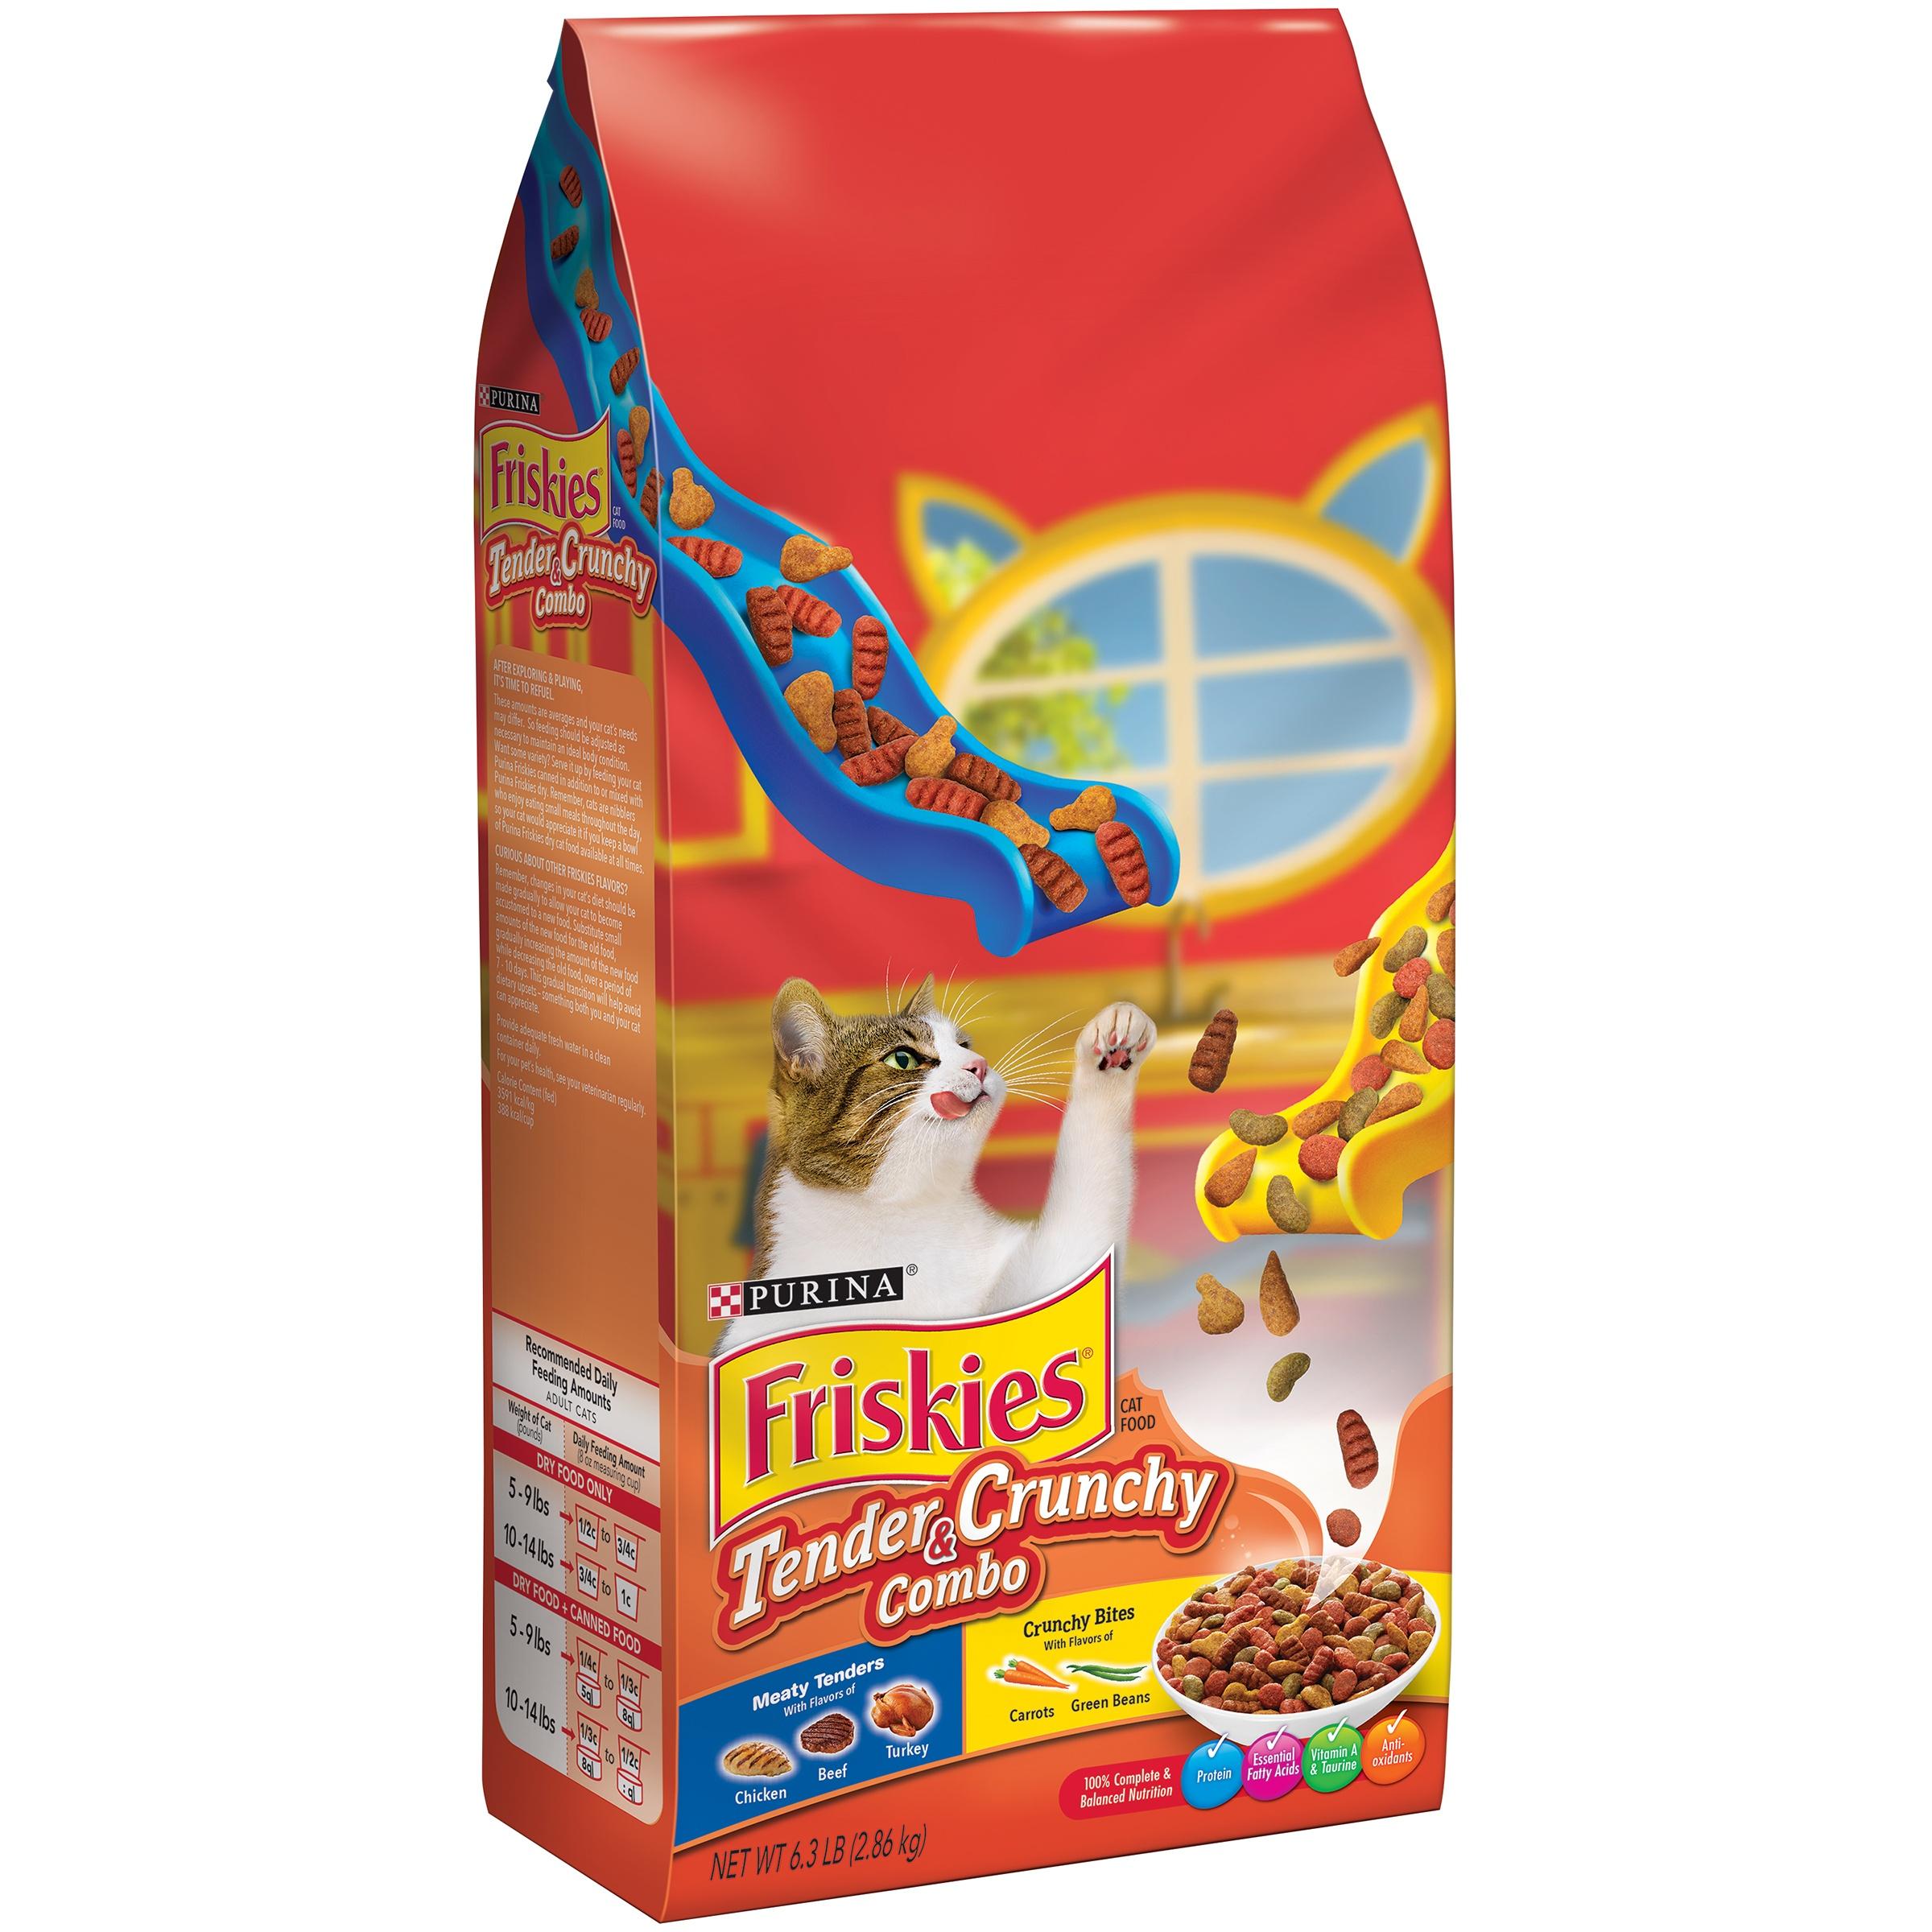 Purina Friskies Tender & Crunchy Combo Cat Food 6.3 lb. Bag